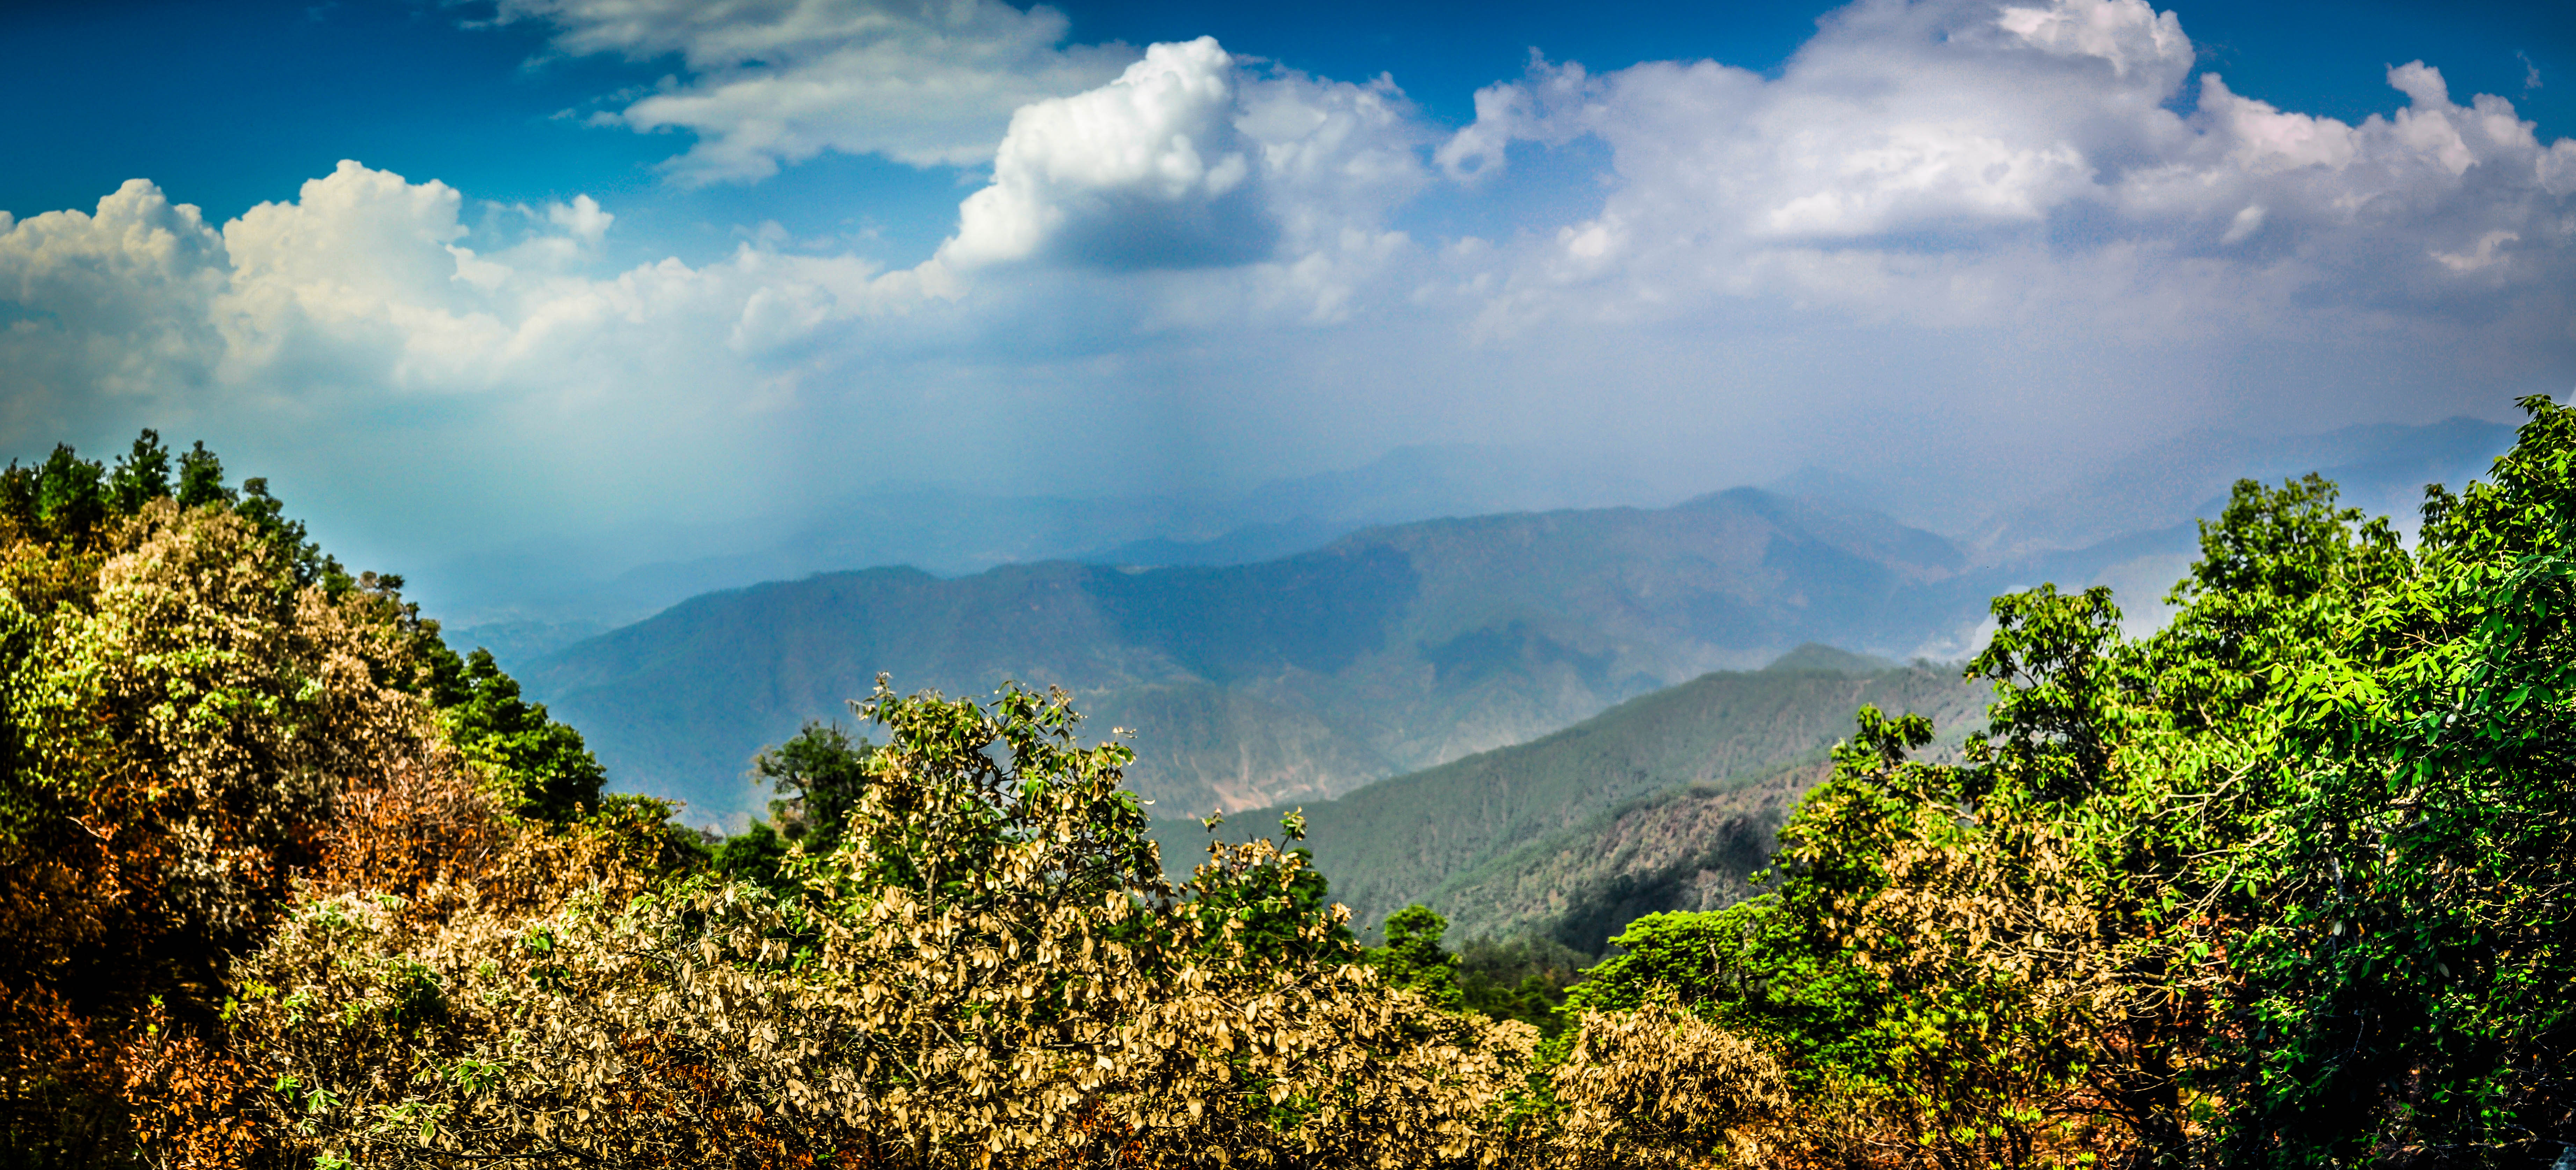 Binsar, Uttarakhand - A Fascinating Breakthrough. 6